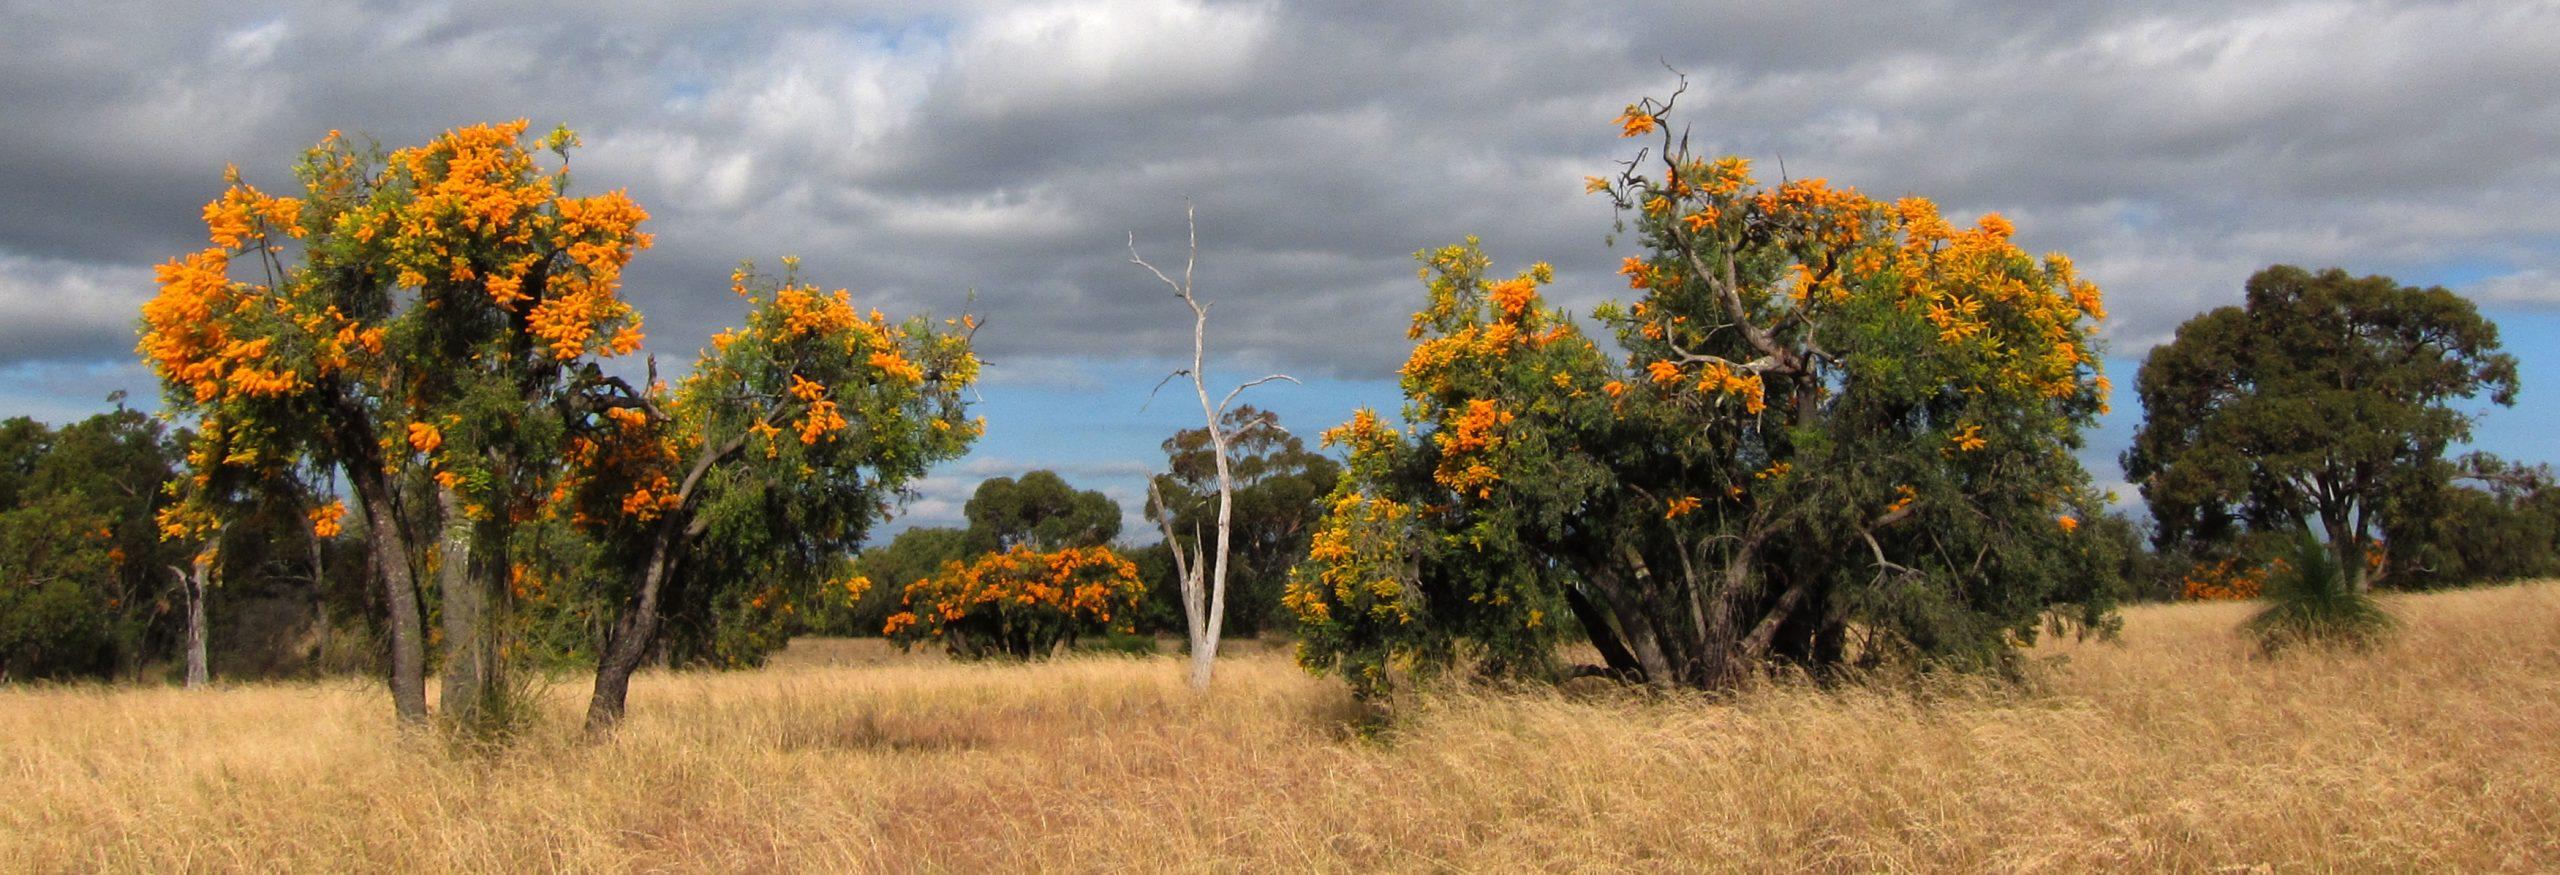 Nuytsia floribunda en hábitat